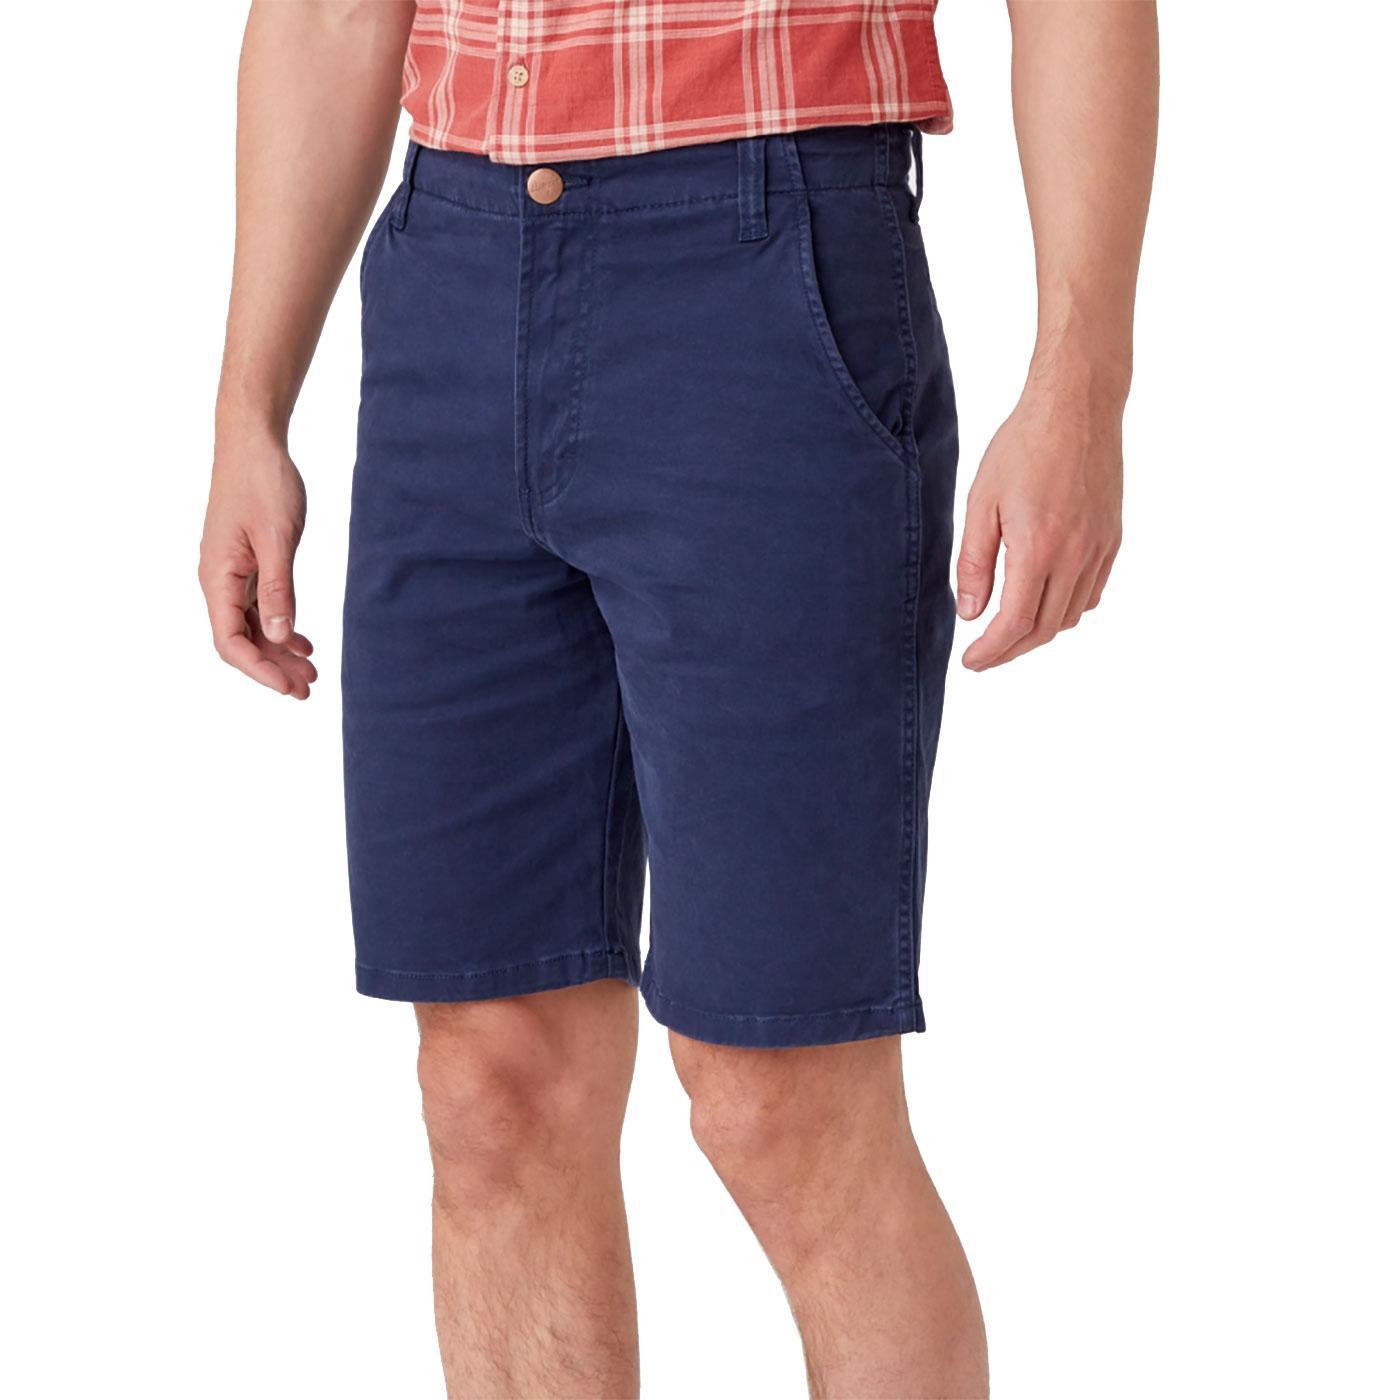 Casey WRANGLER Men's Retro Twill Chino Shorts LB